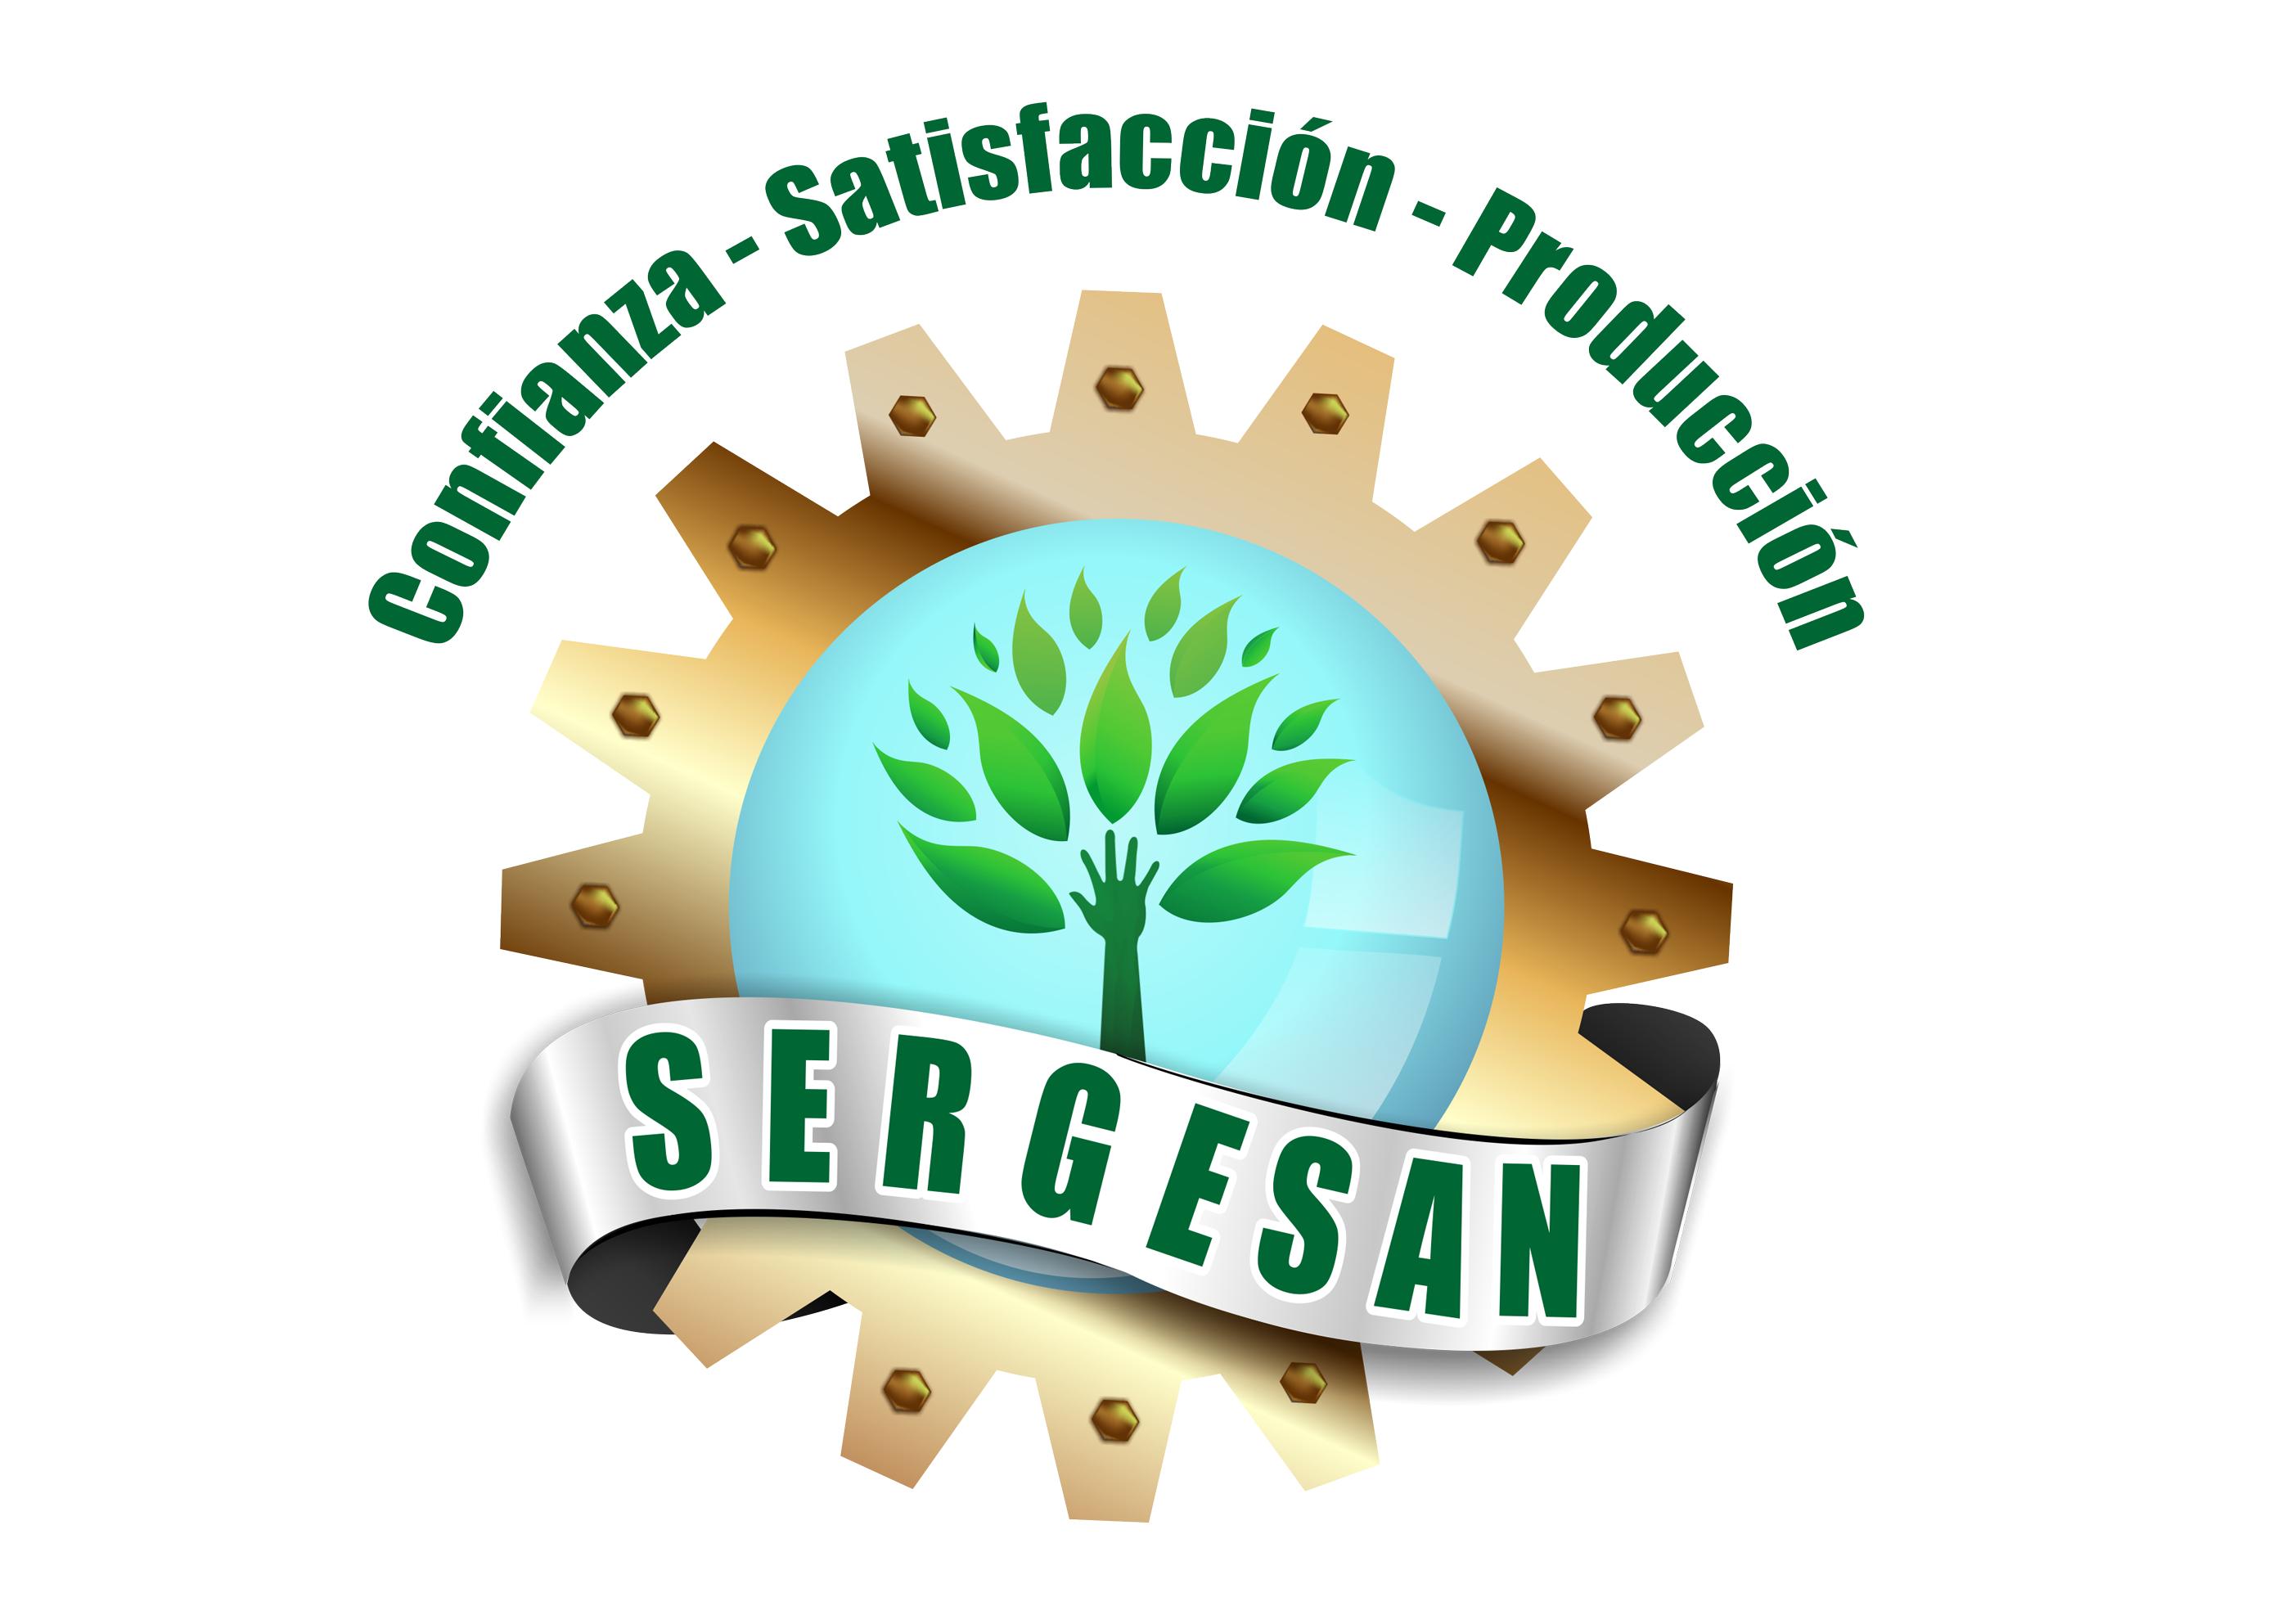 SERGESAN | COLOMBIA